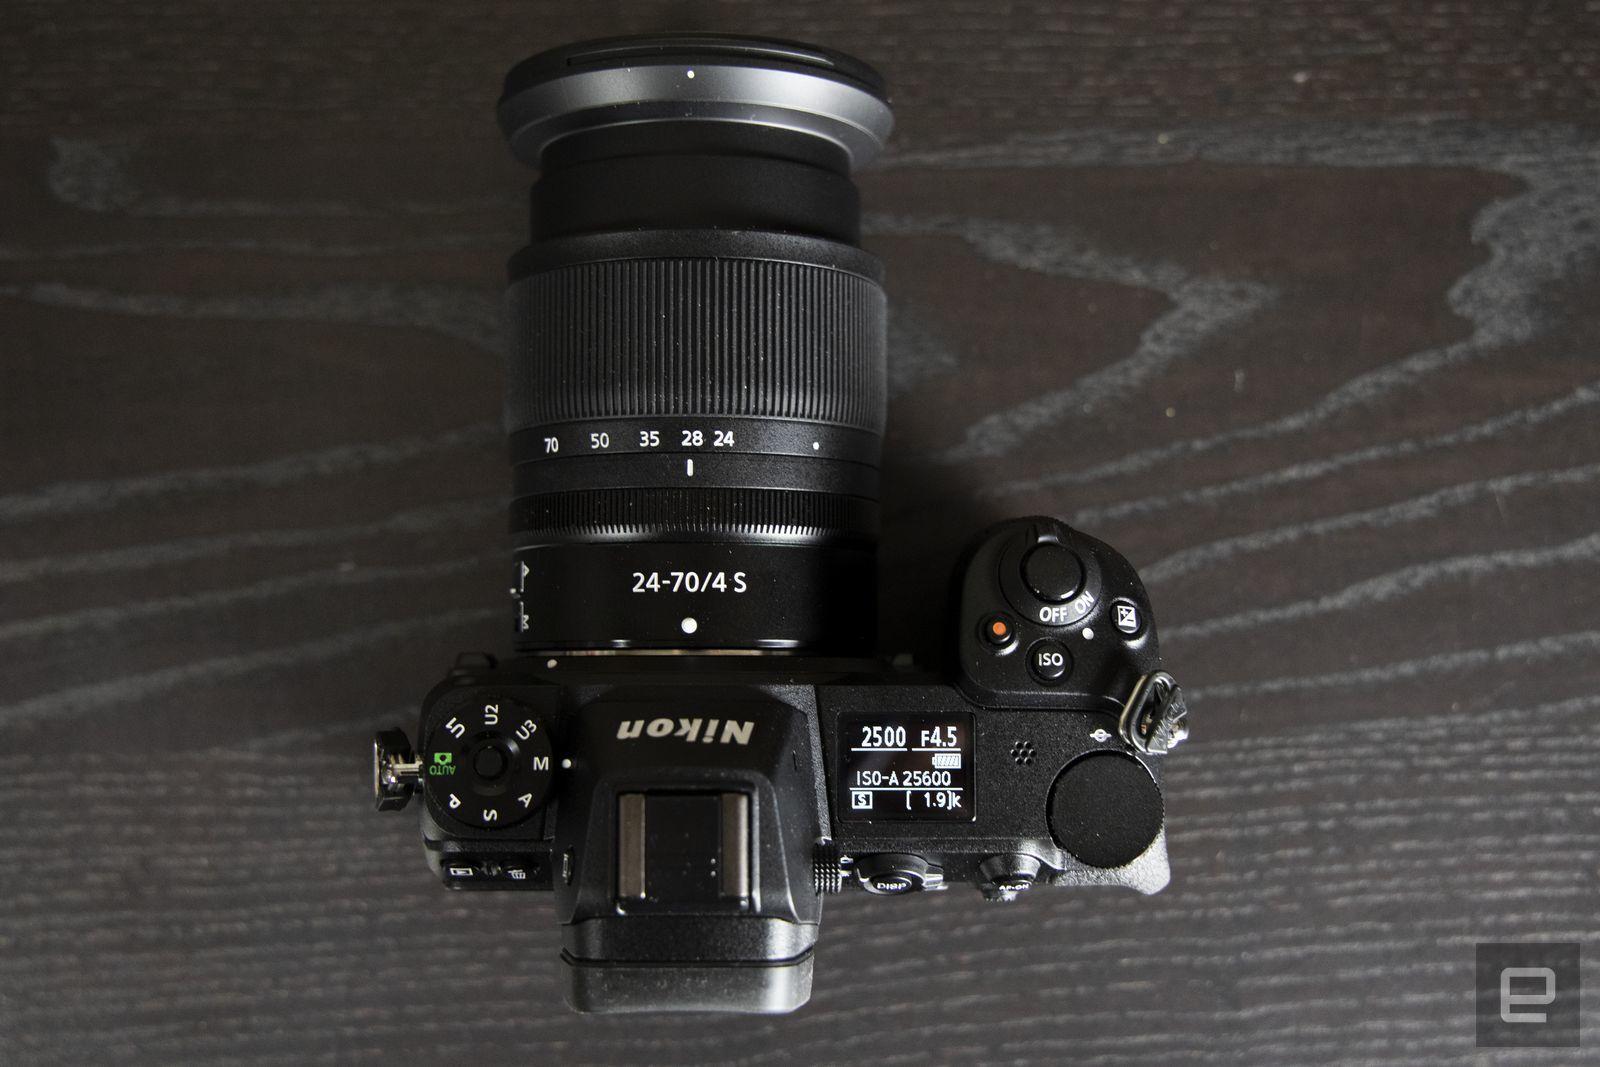 nikon-z7-full-frame-mirrorless-camera-11